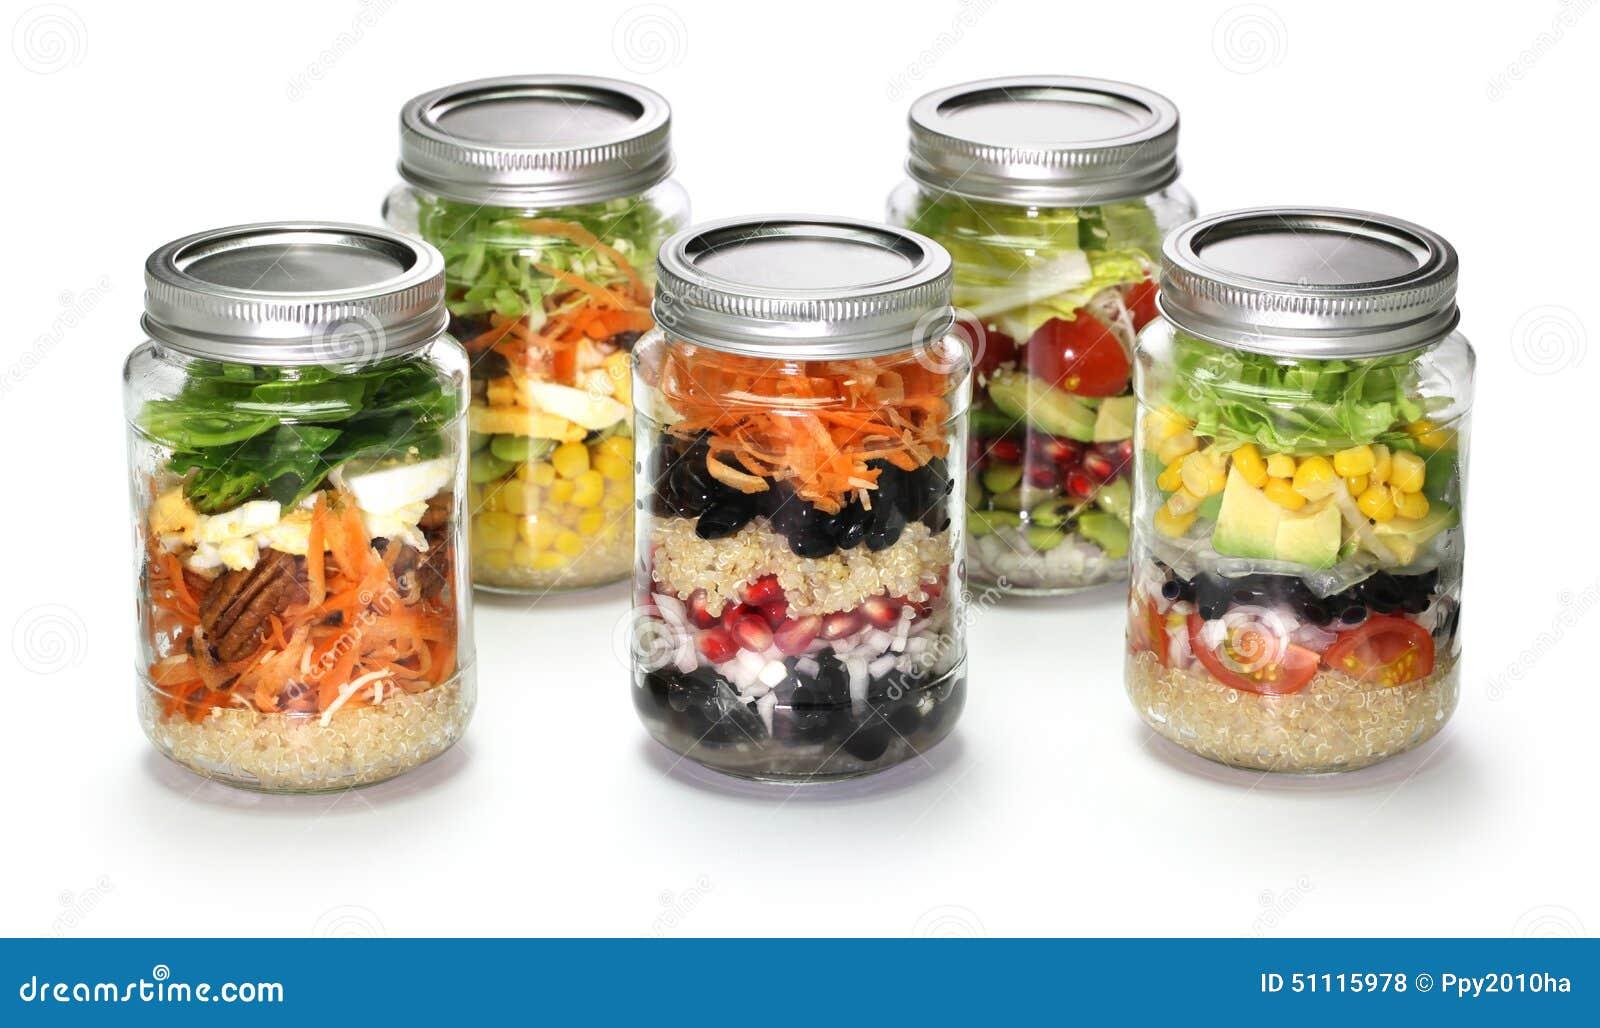 Homemade salad in glass jar